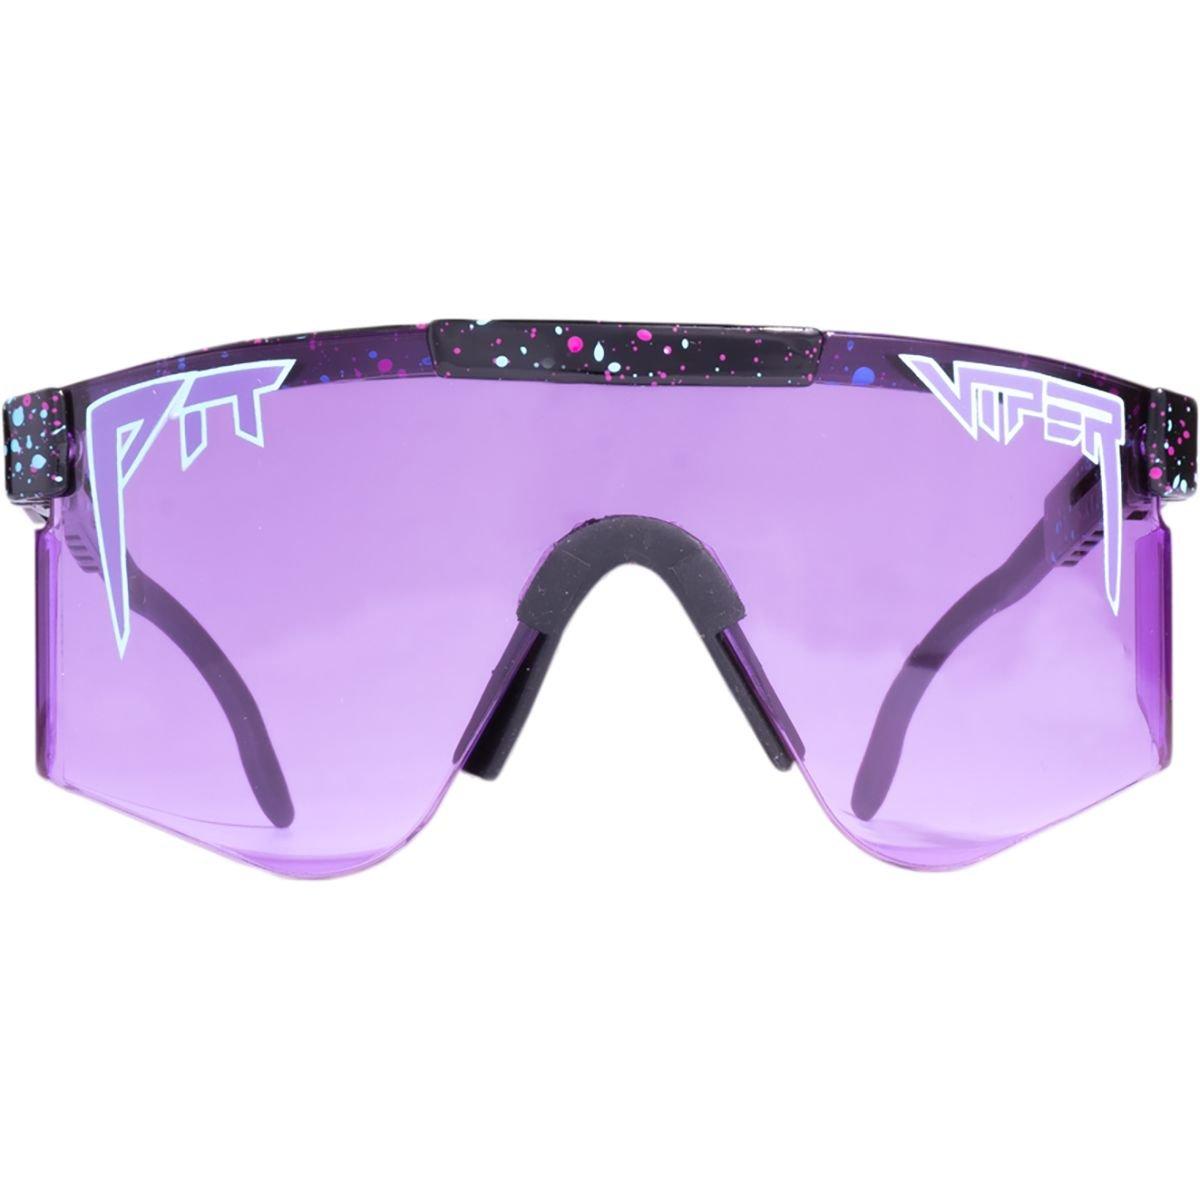 58e27af2c2 ... Pit Viper Fade Lens Sunglasses Purple Amazon co uk Clothing